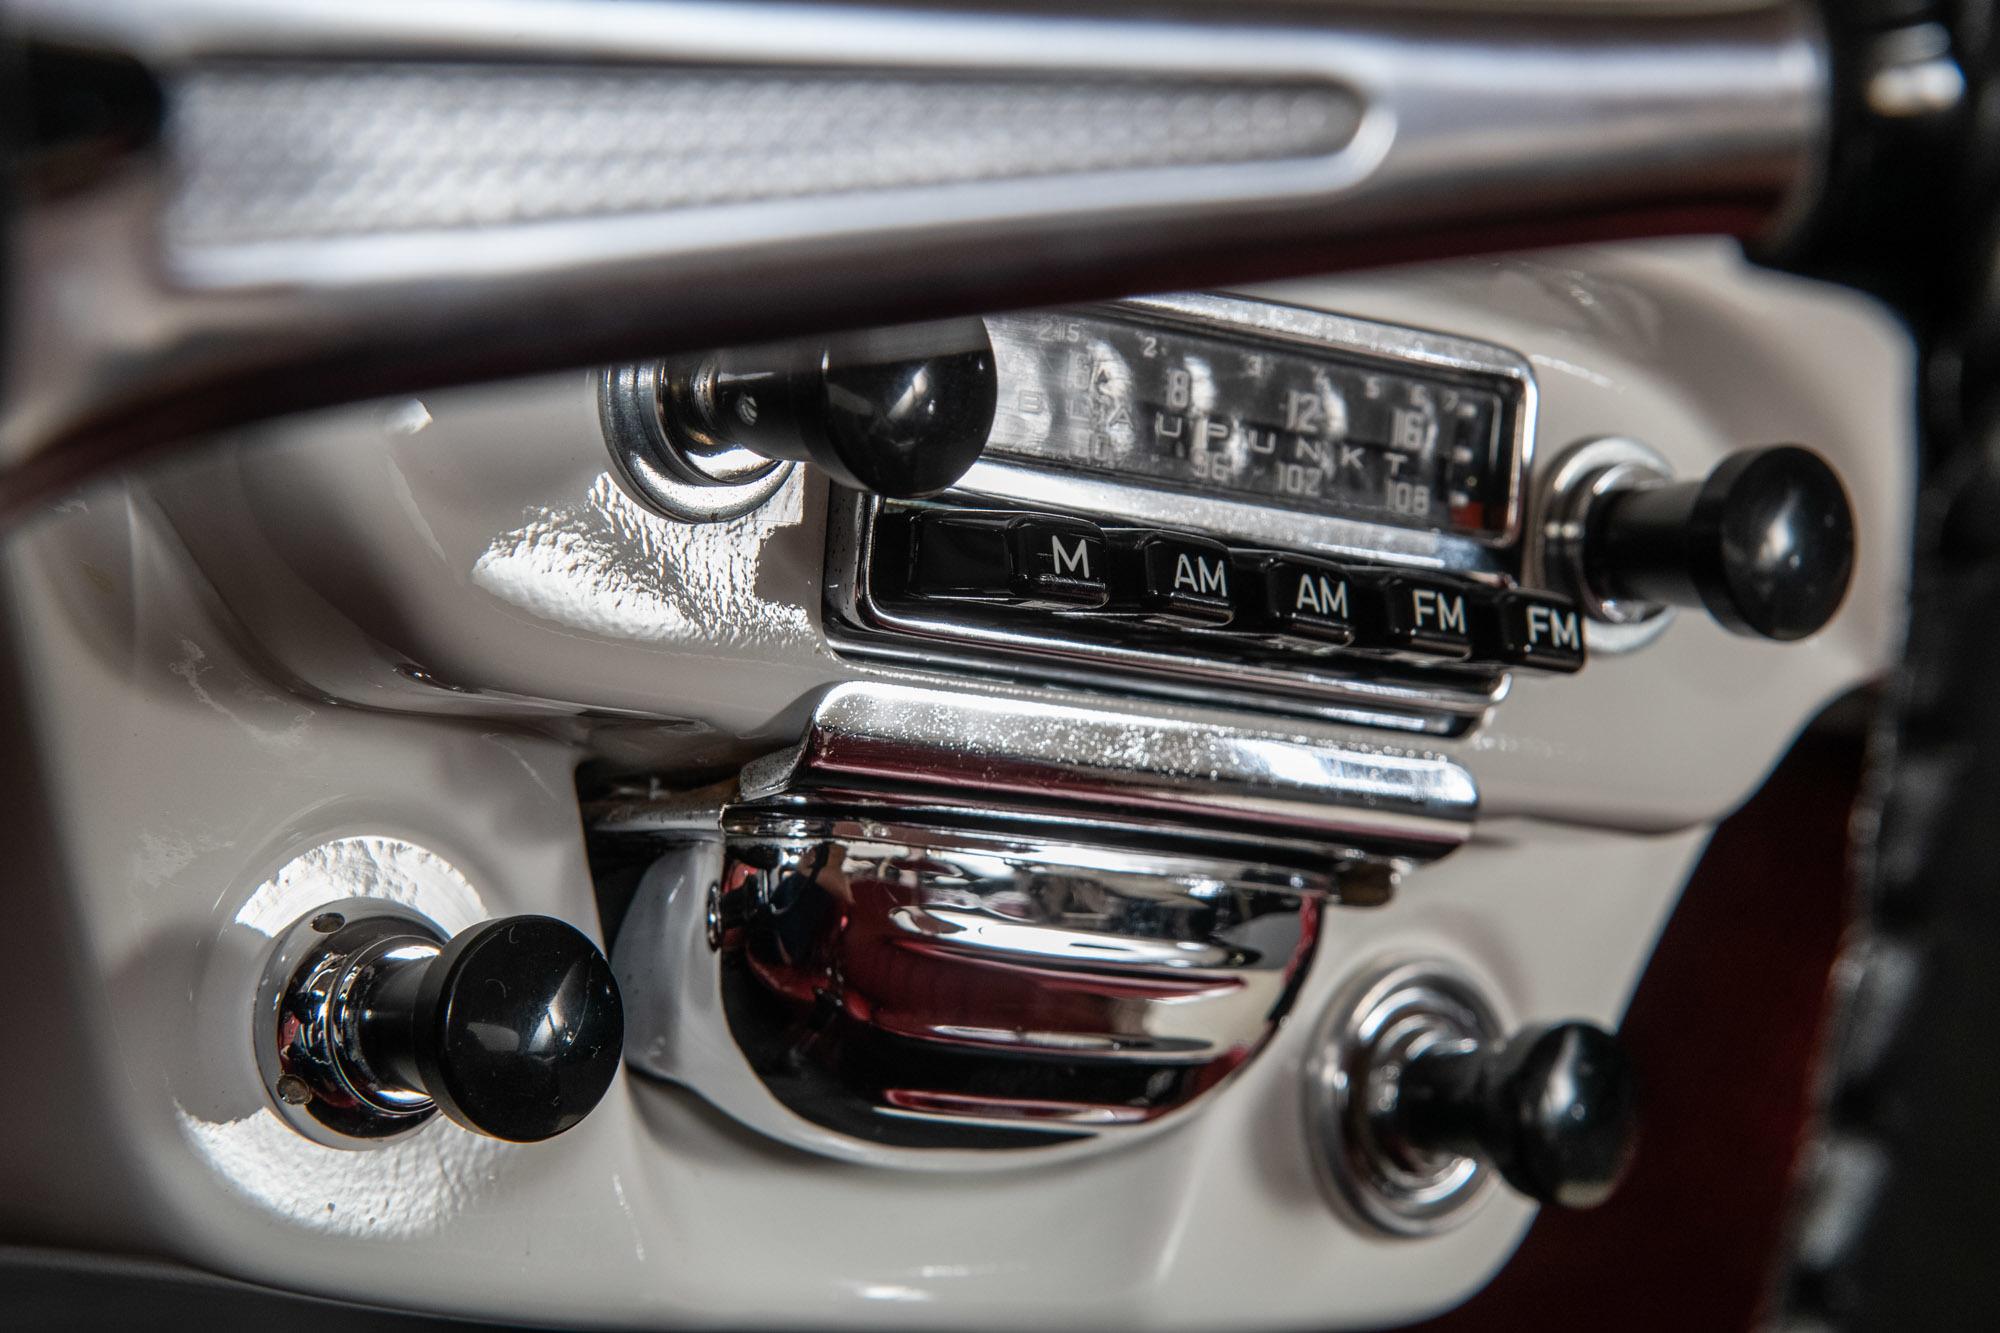 1964 Porsche 356 SC , LIGHT IVORY, VIN 215096, MILEAGE 3626